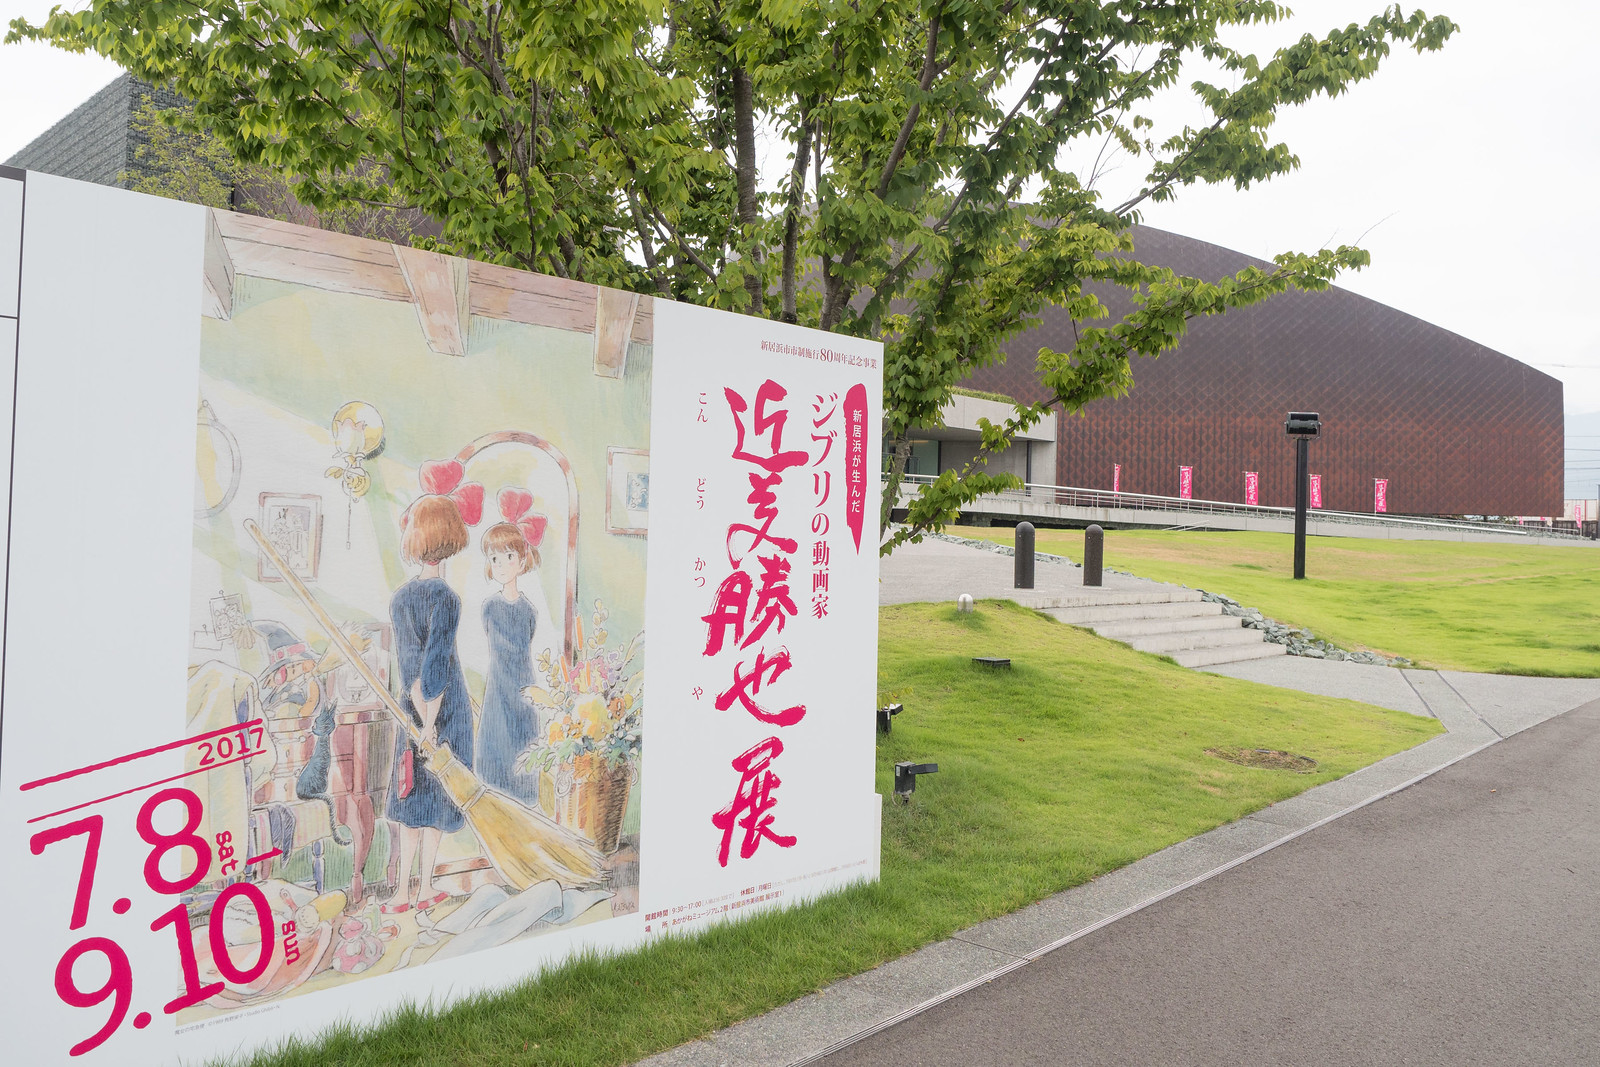 Ghibli_katsuyakondo-38